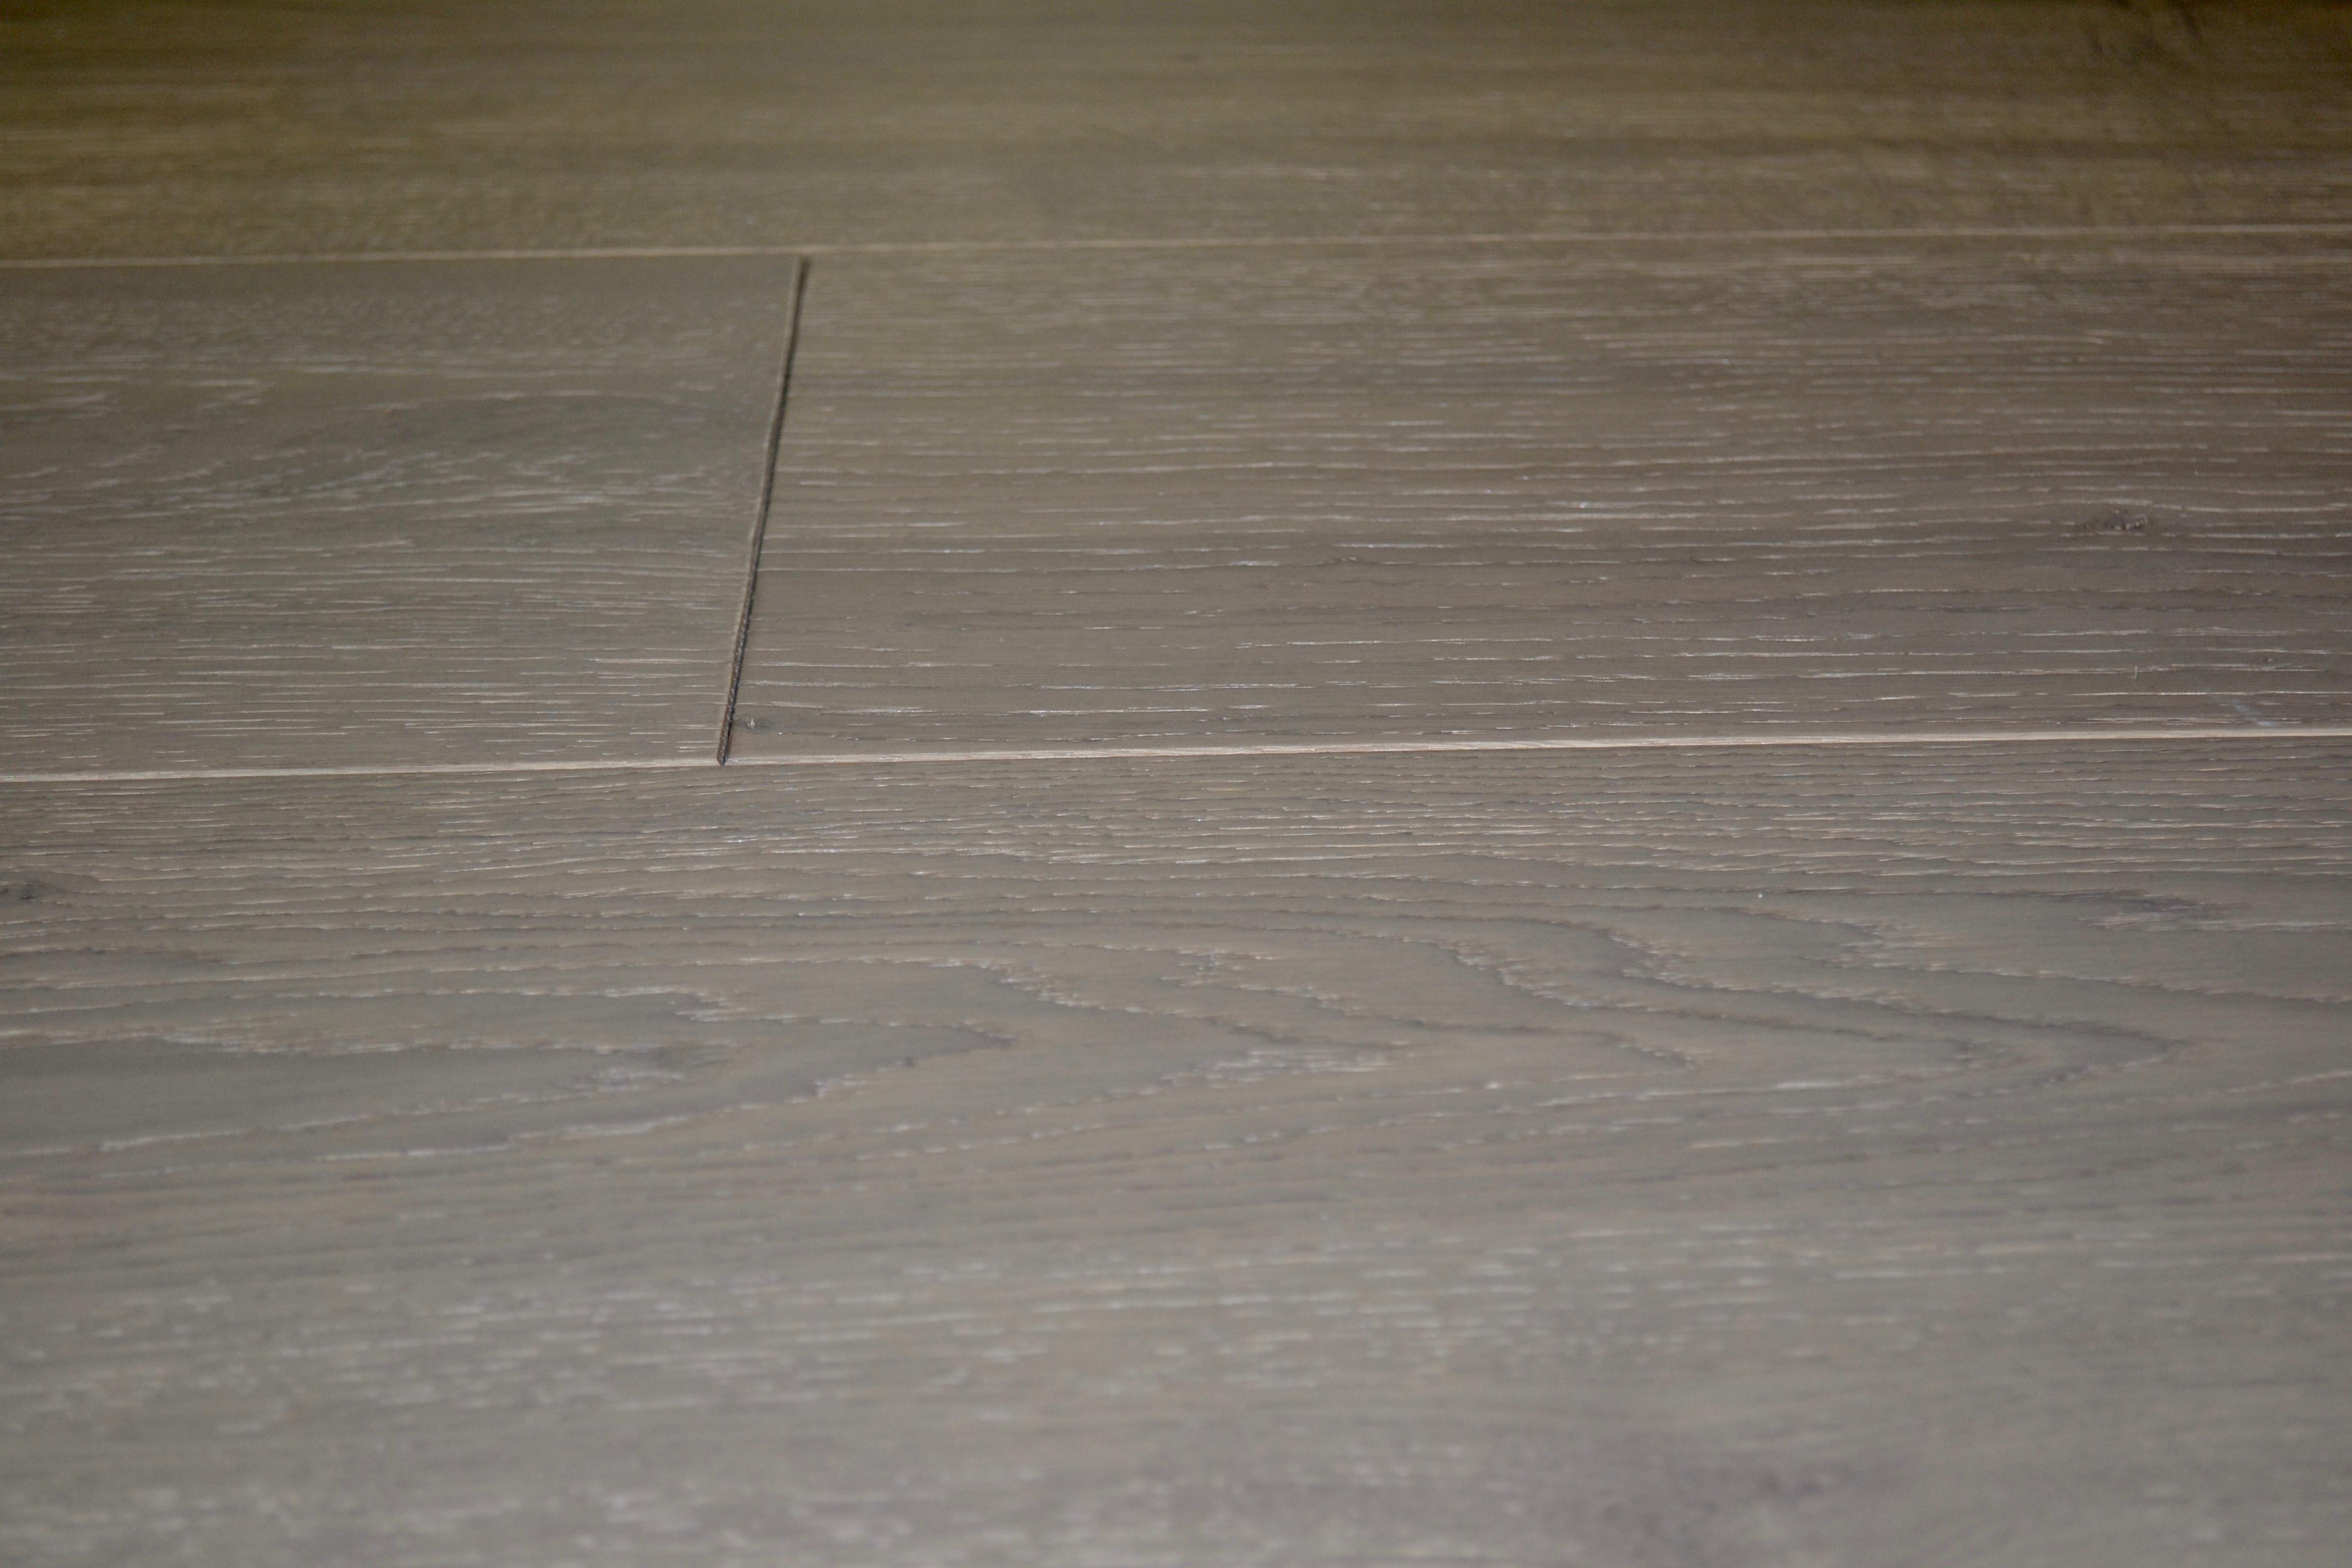 hardwood floor supply dallas of villa caprisi fine european hardwood millennium hardwood pertaining to european style inspired designer oak floor brindisi by villa caprisi